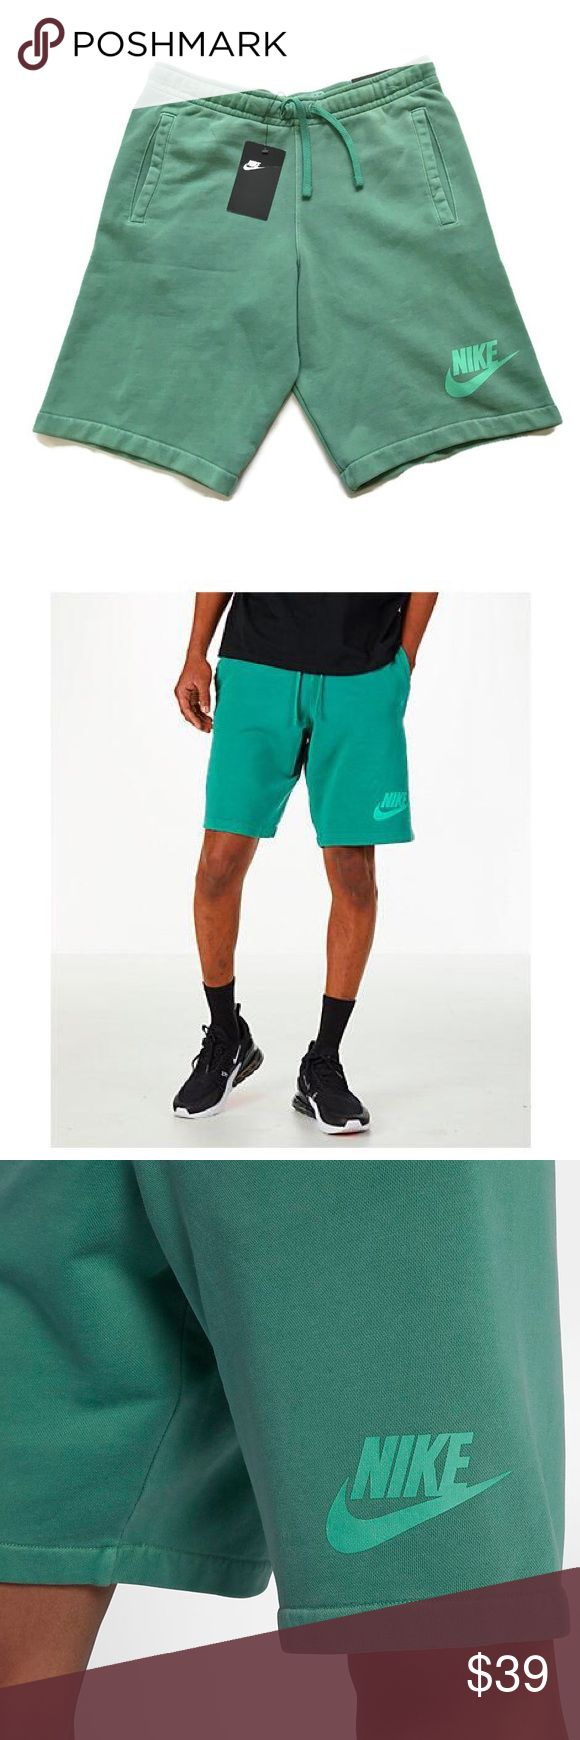 NWT Herren French Terry Shorts – Grün NWT Herren Small grün French …   – My Posh Picks